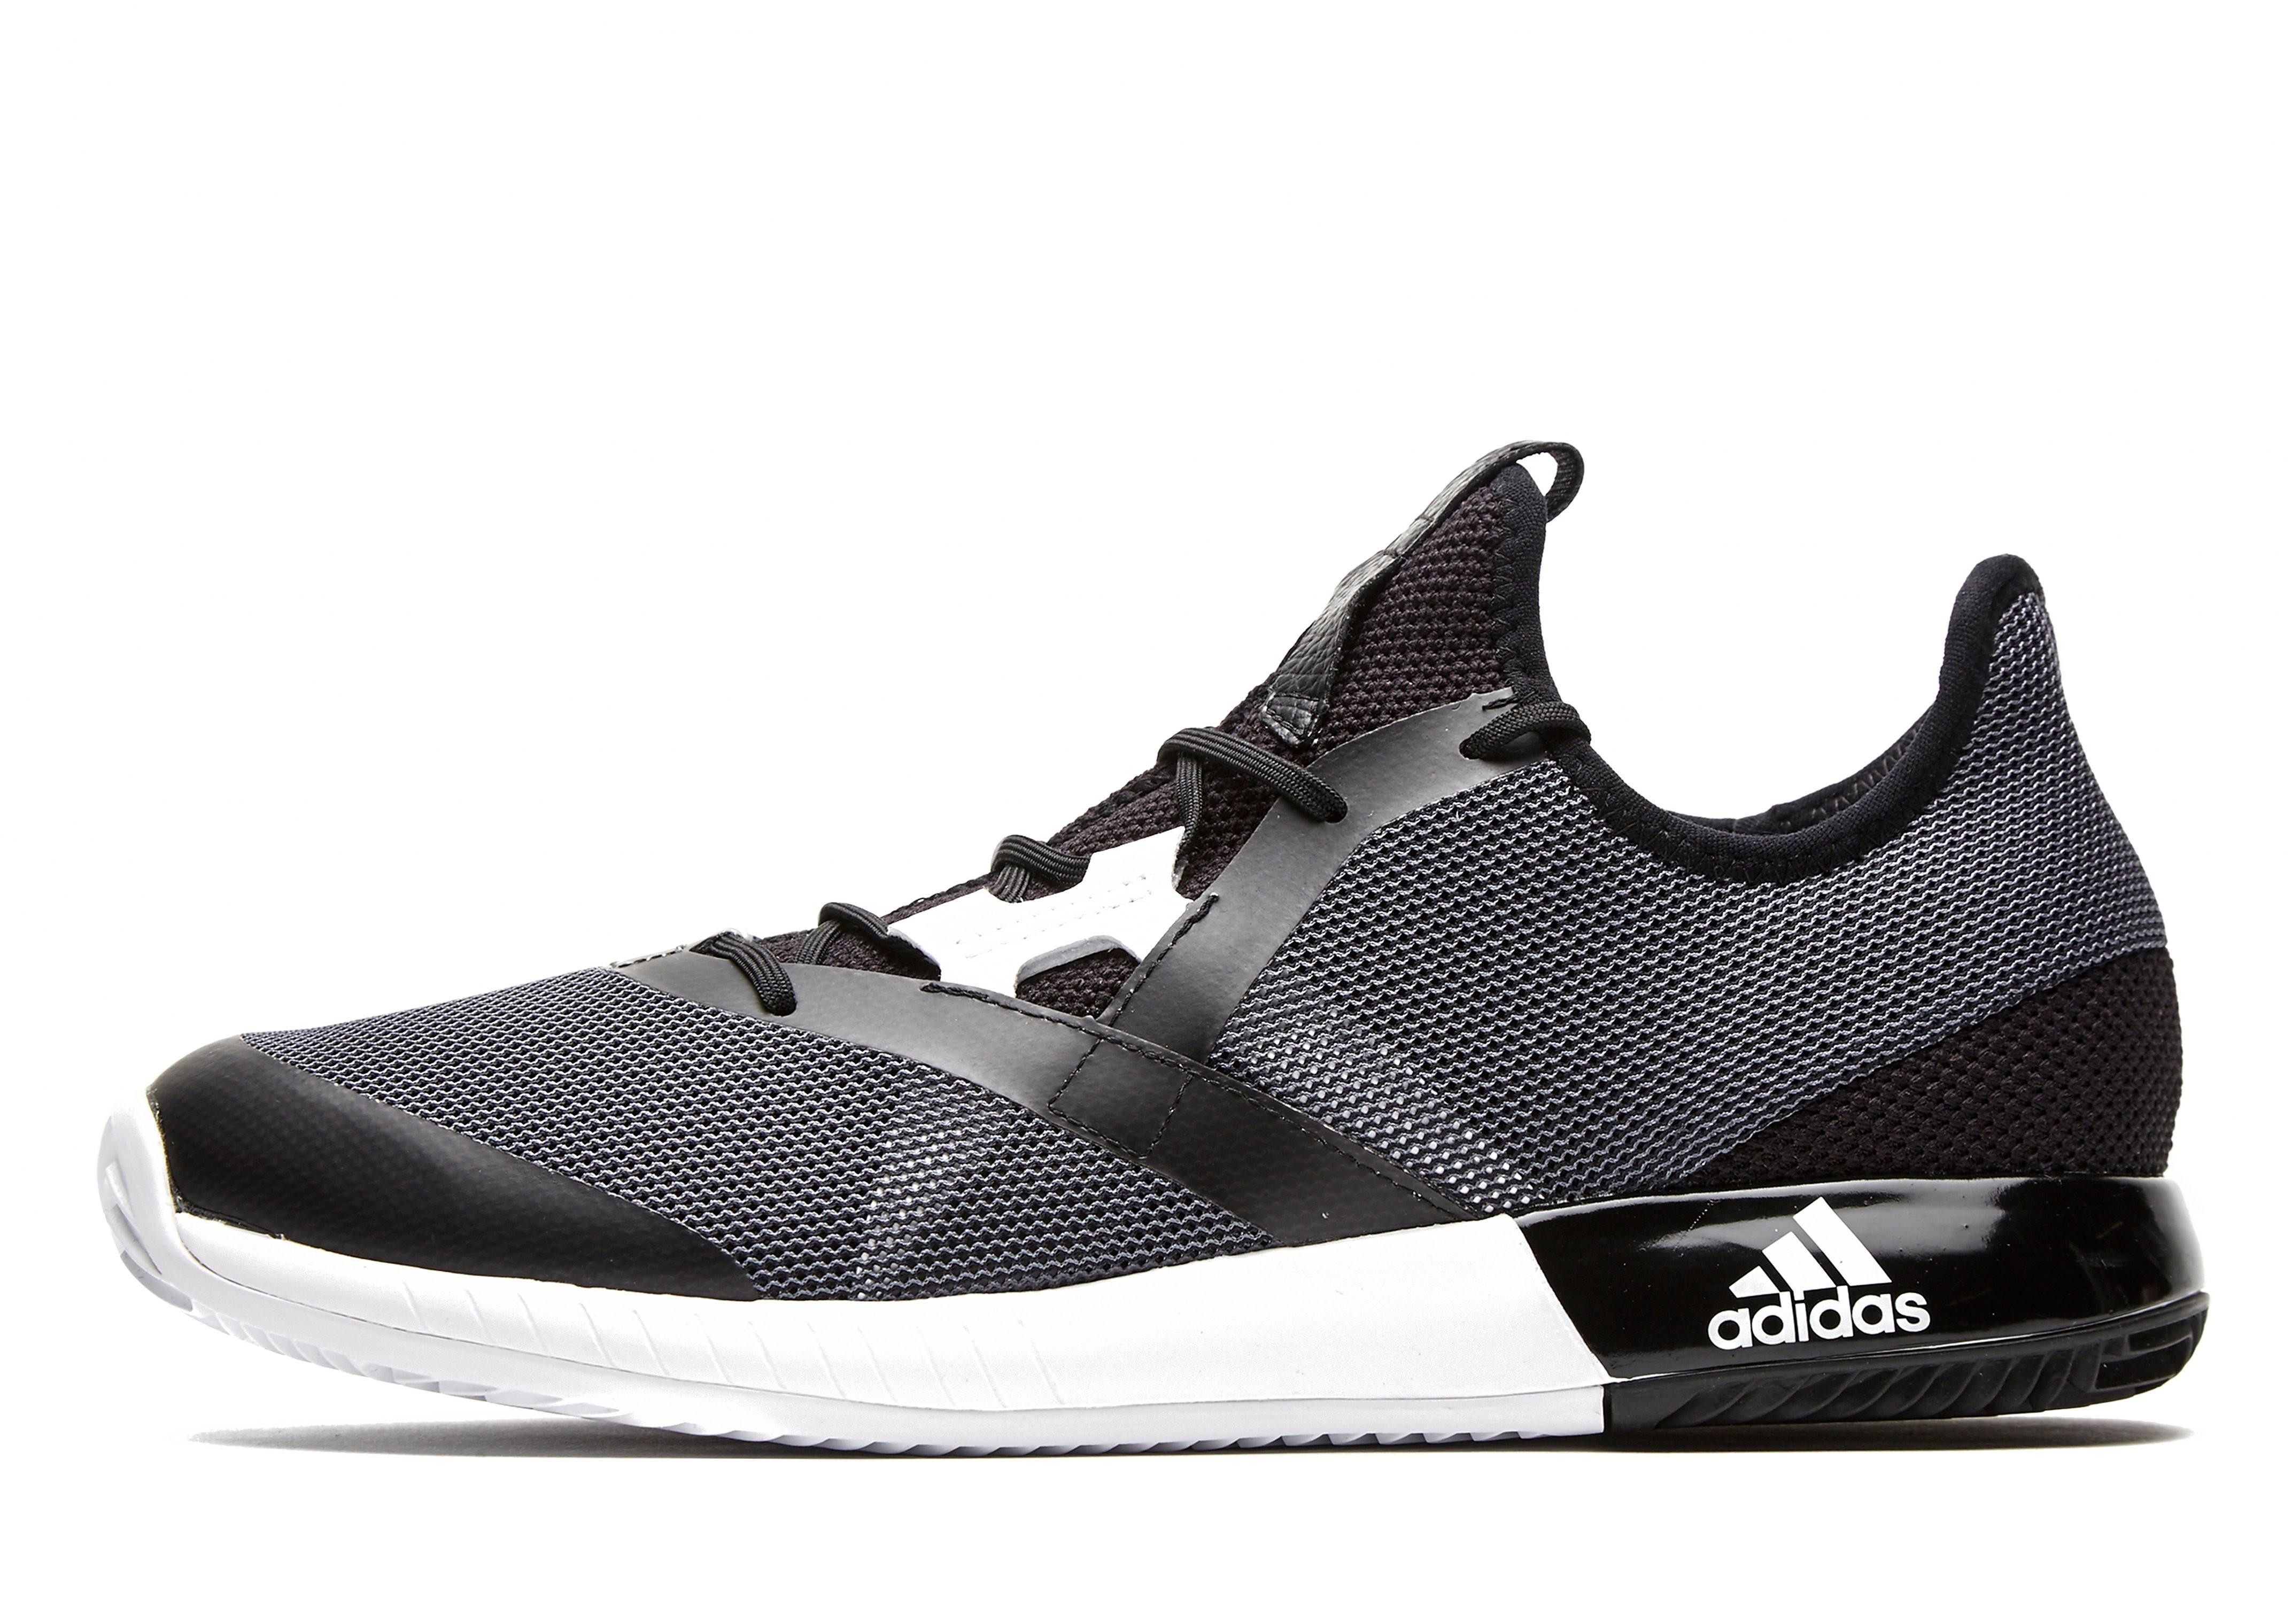 adidas Adizero Defiant Bounce Tennis Shoes